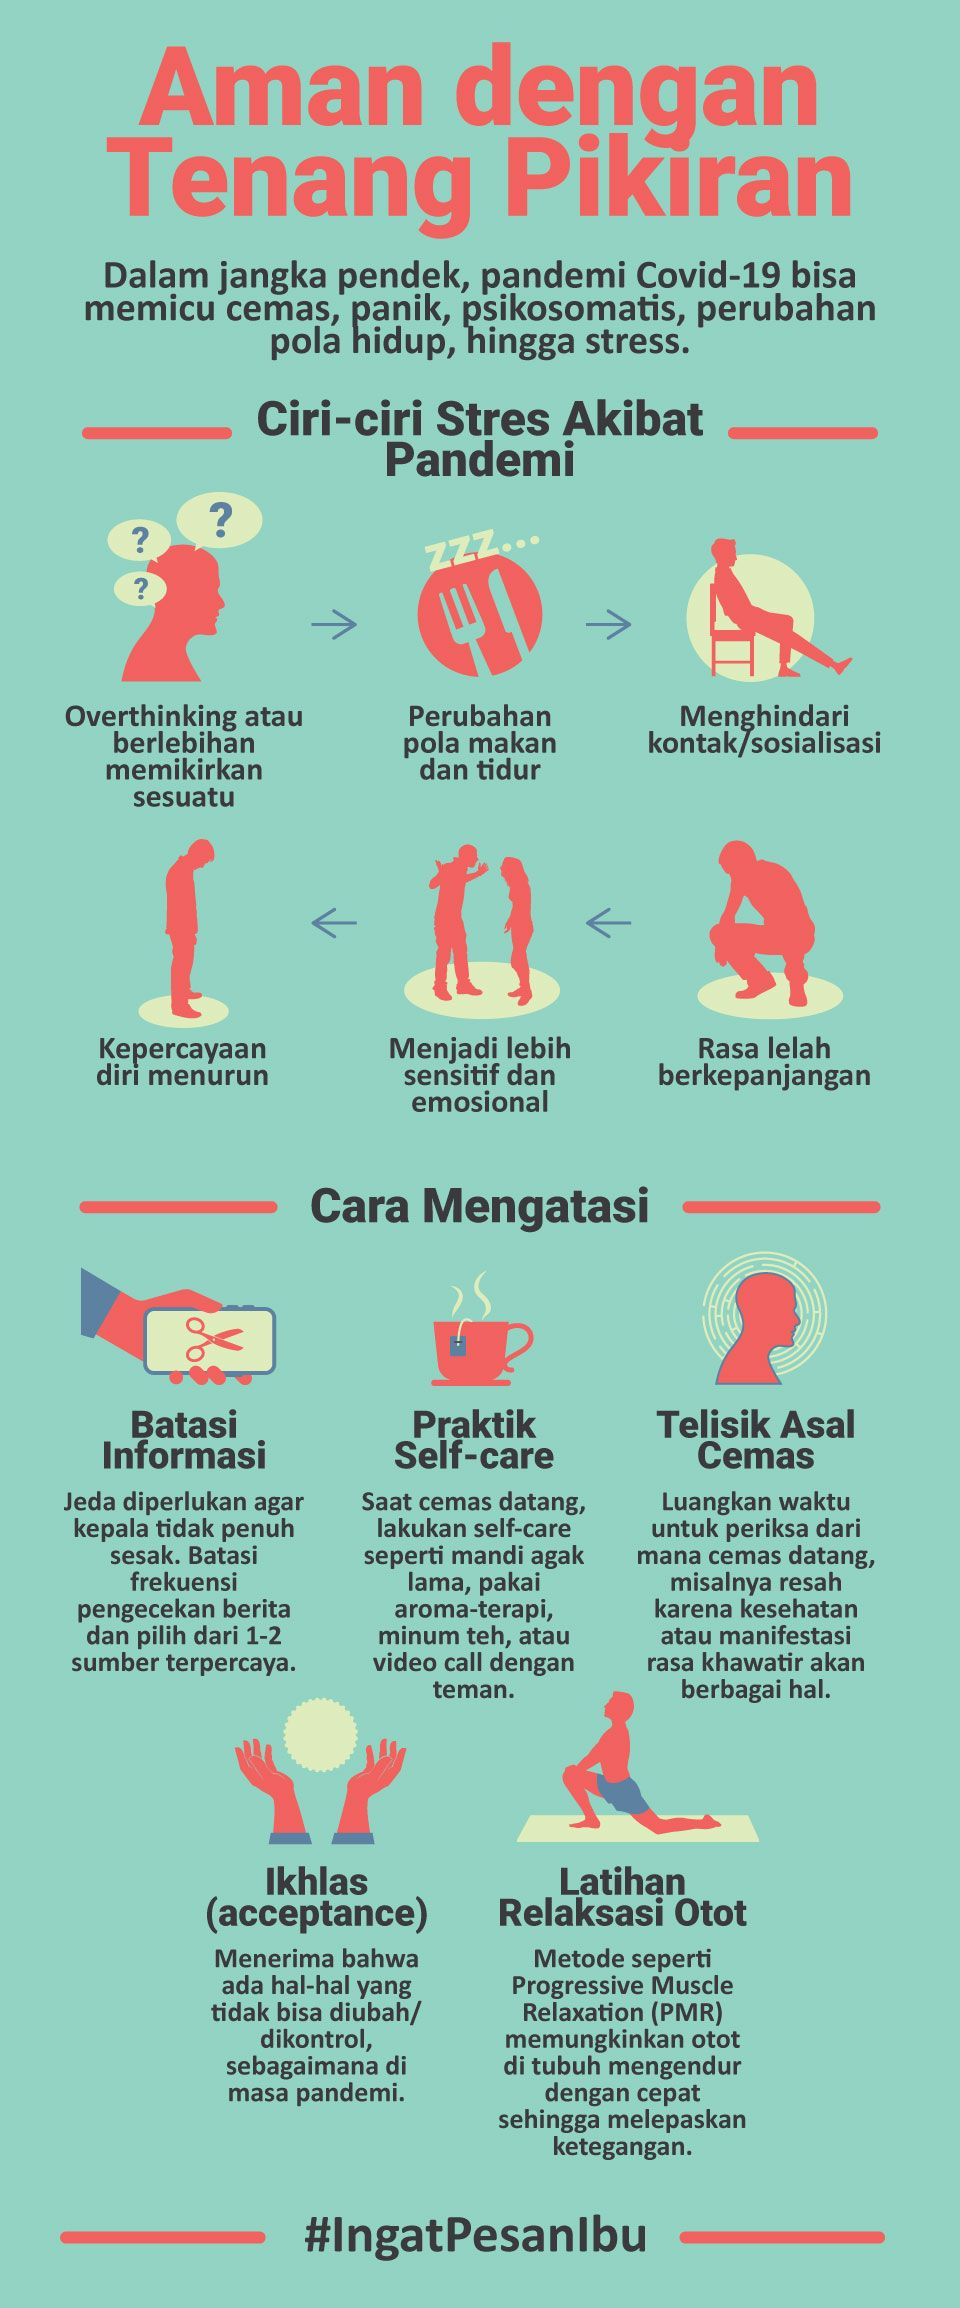 Infografis Aman dengan Tenang Pikiran